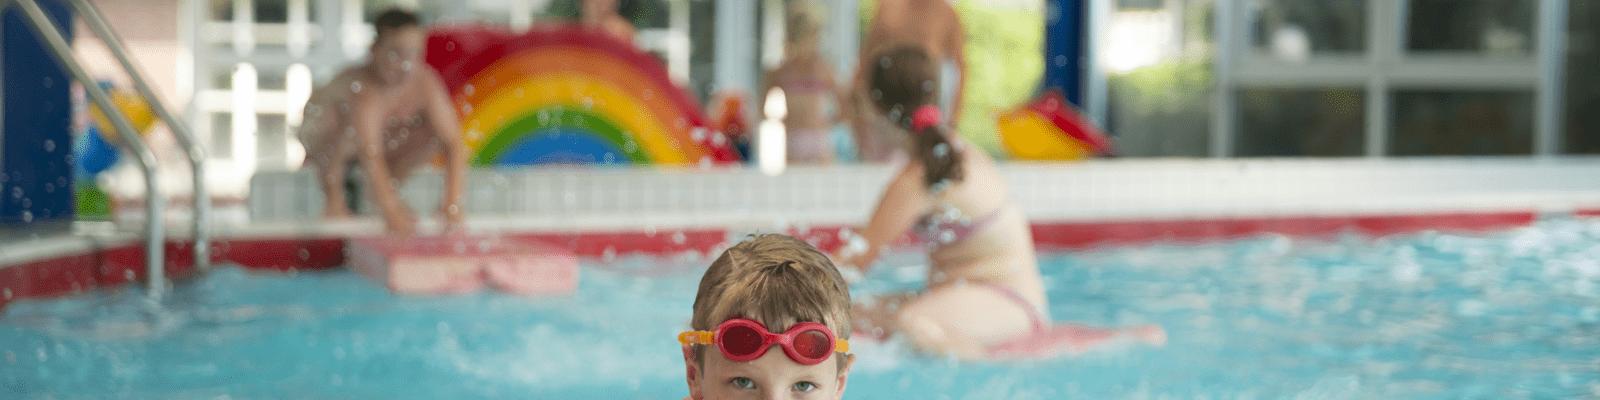 Kinderfeestje Zwemmen